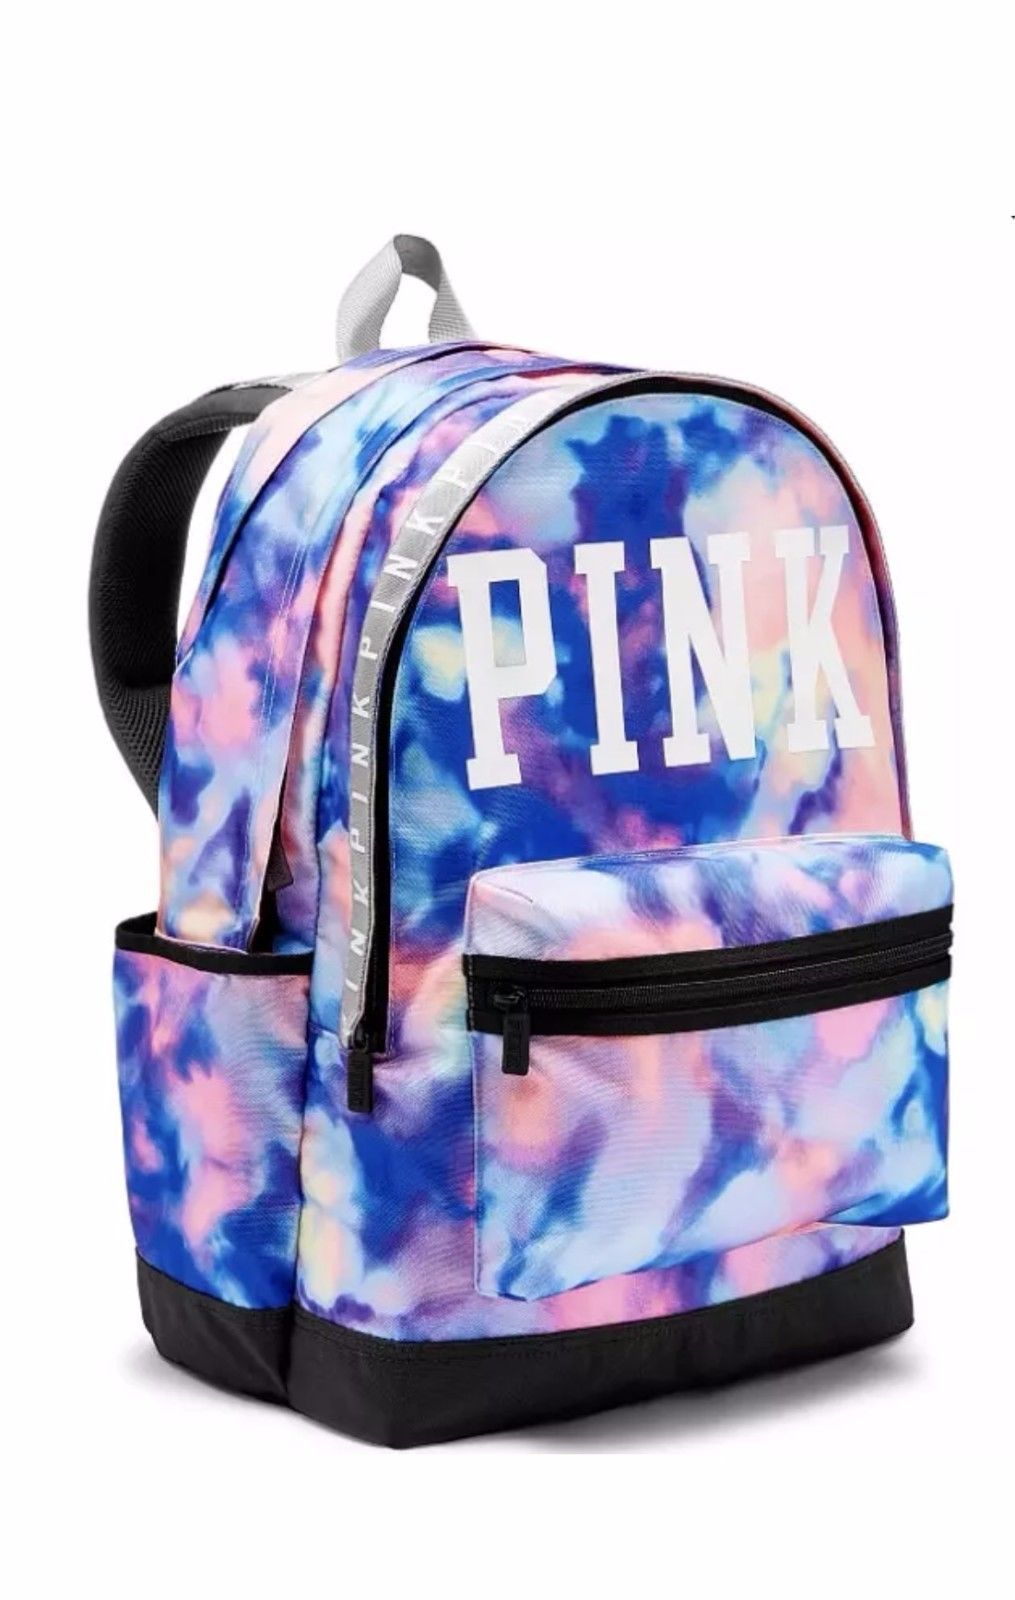 Victoria S Secret Vs Pink Tie Dye Tye Campus Backpack Bookbag Nwt